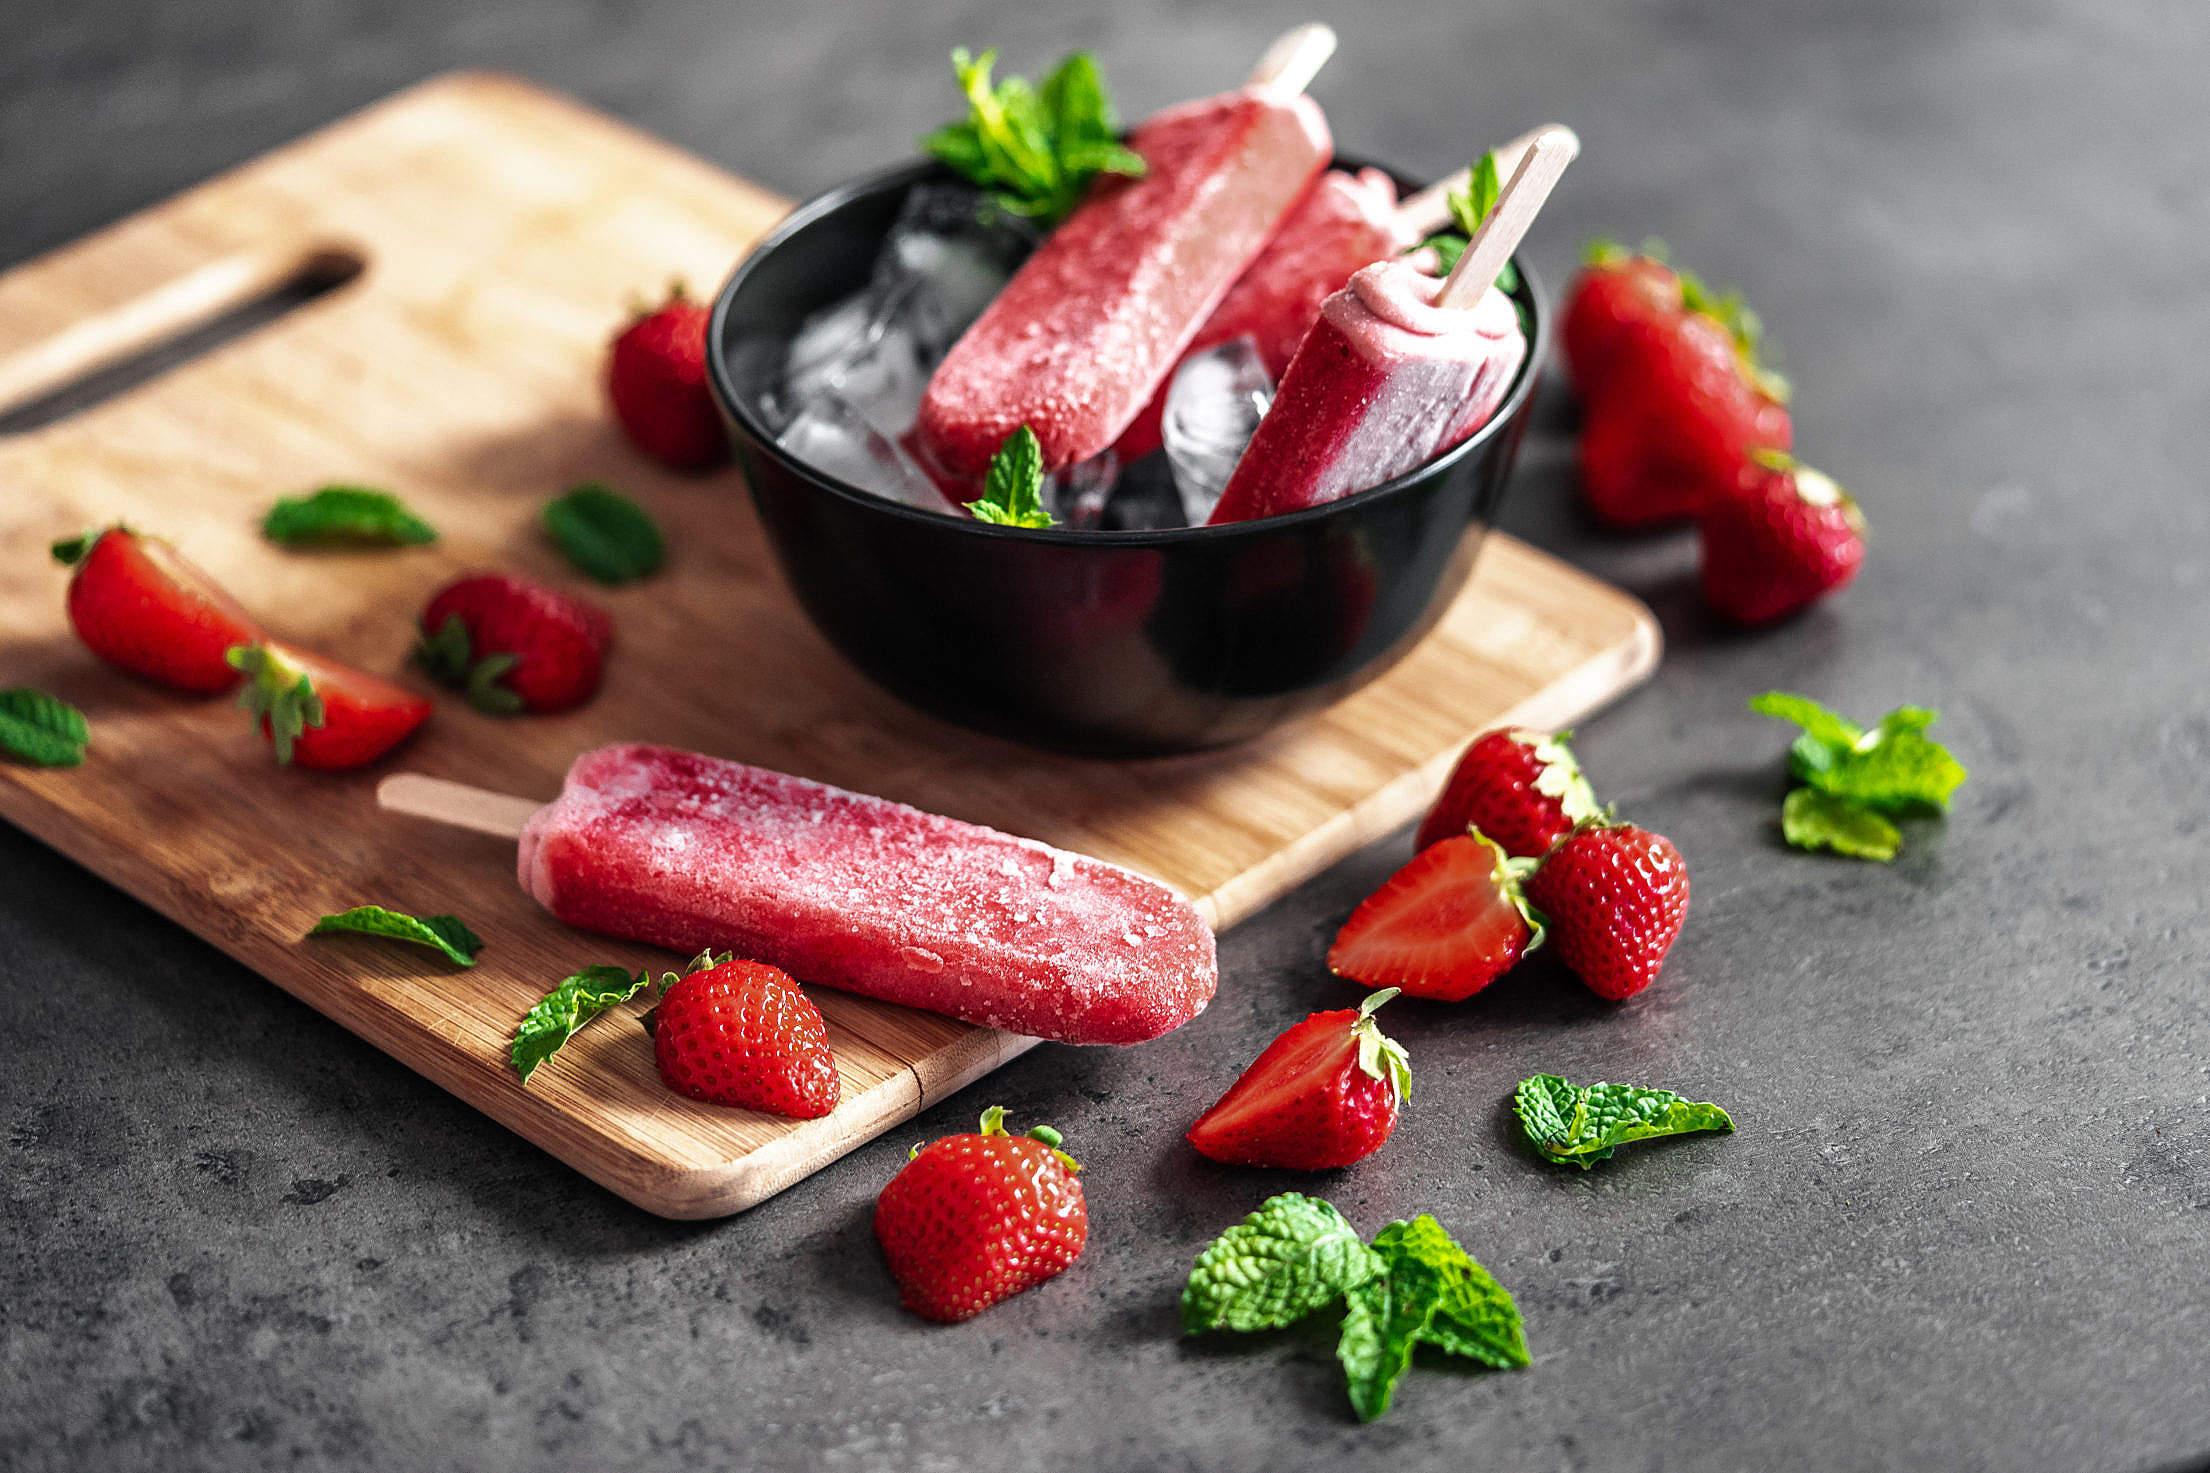 Homemade Vegan Strawberry Popsicles Free Stock Photo